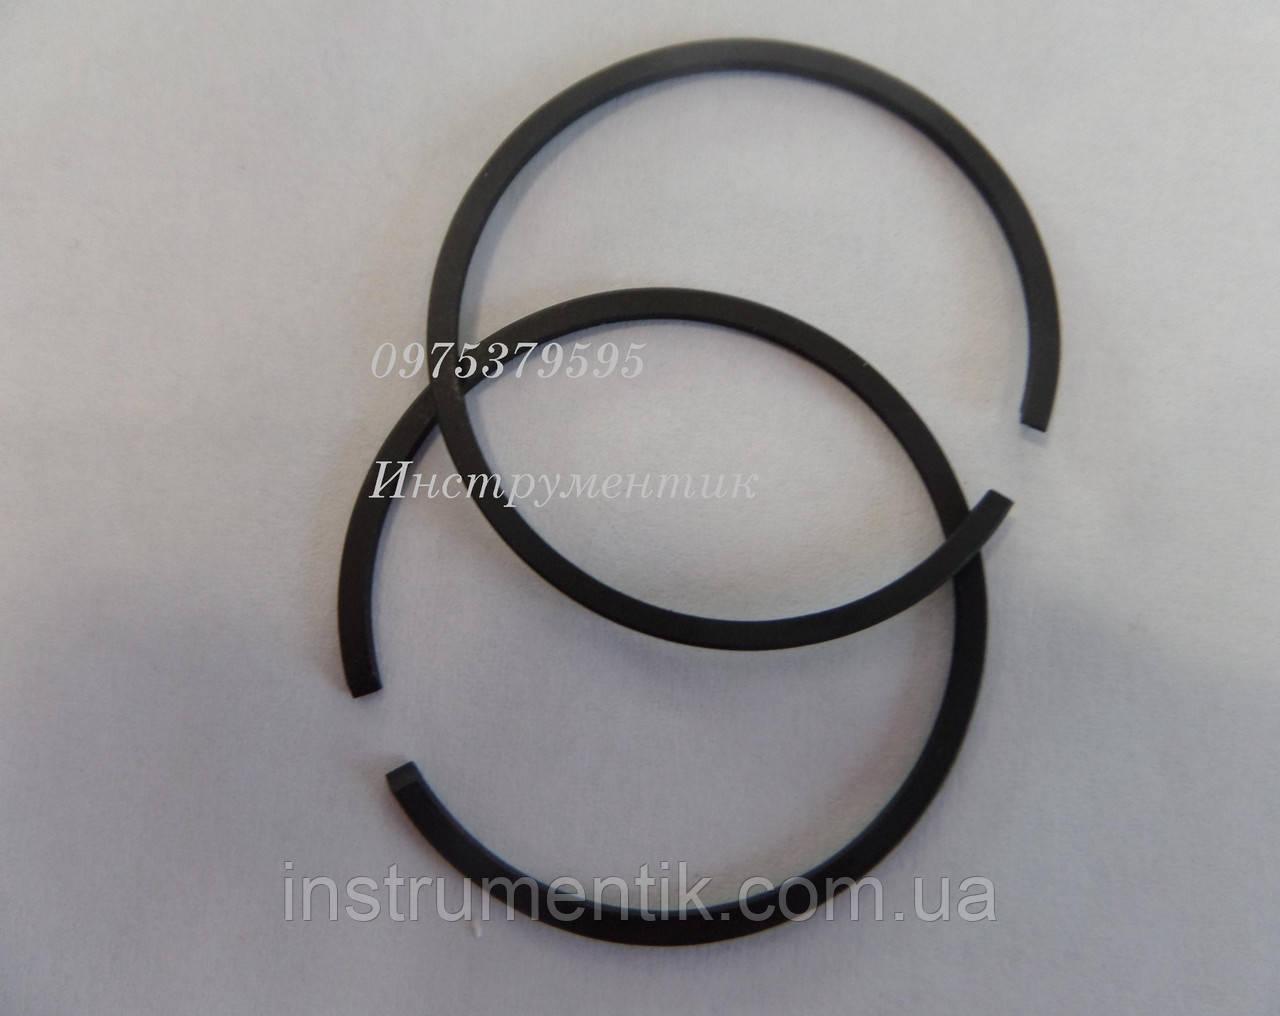 Кольца поршневые для Stihl MS 180 (цена за 2 шт.)